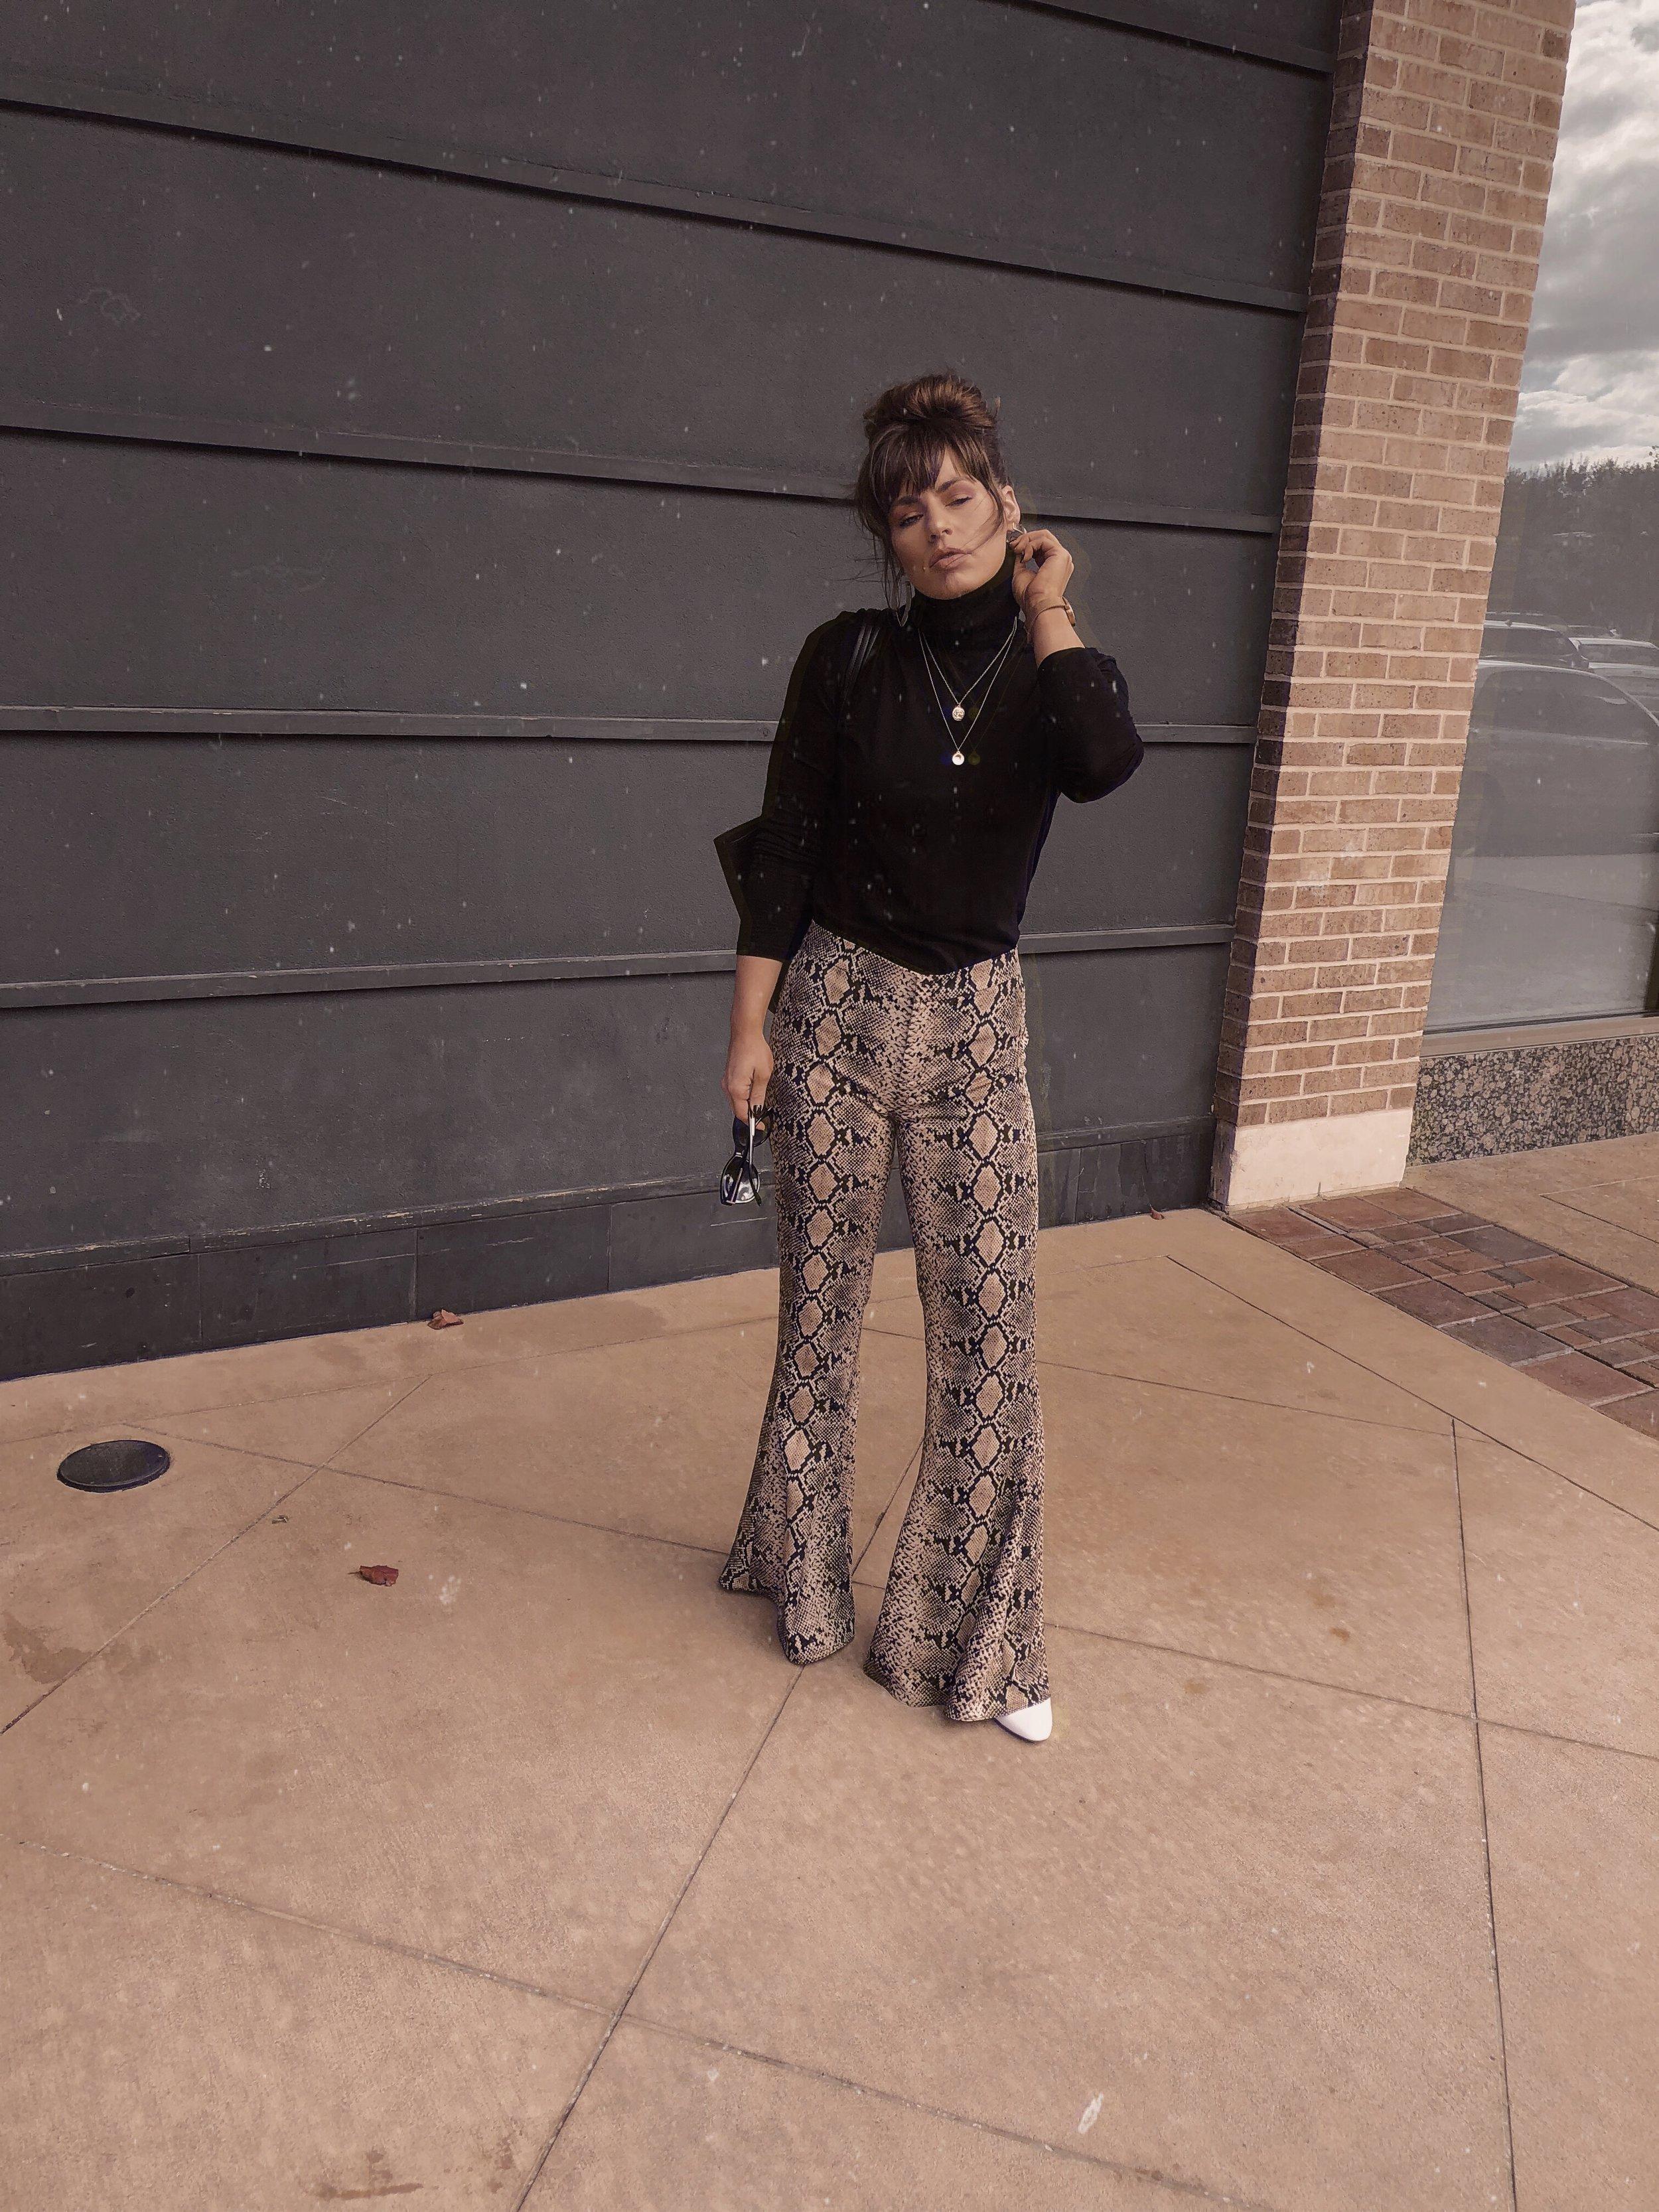 Snakeskin Pants with Black Turtleneck